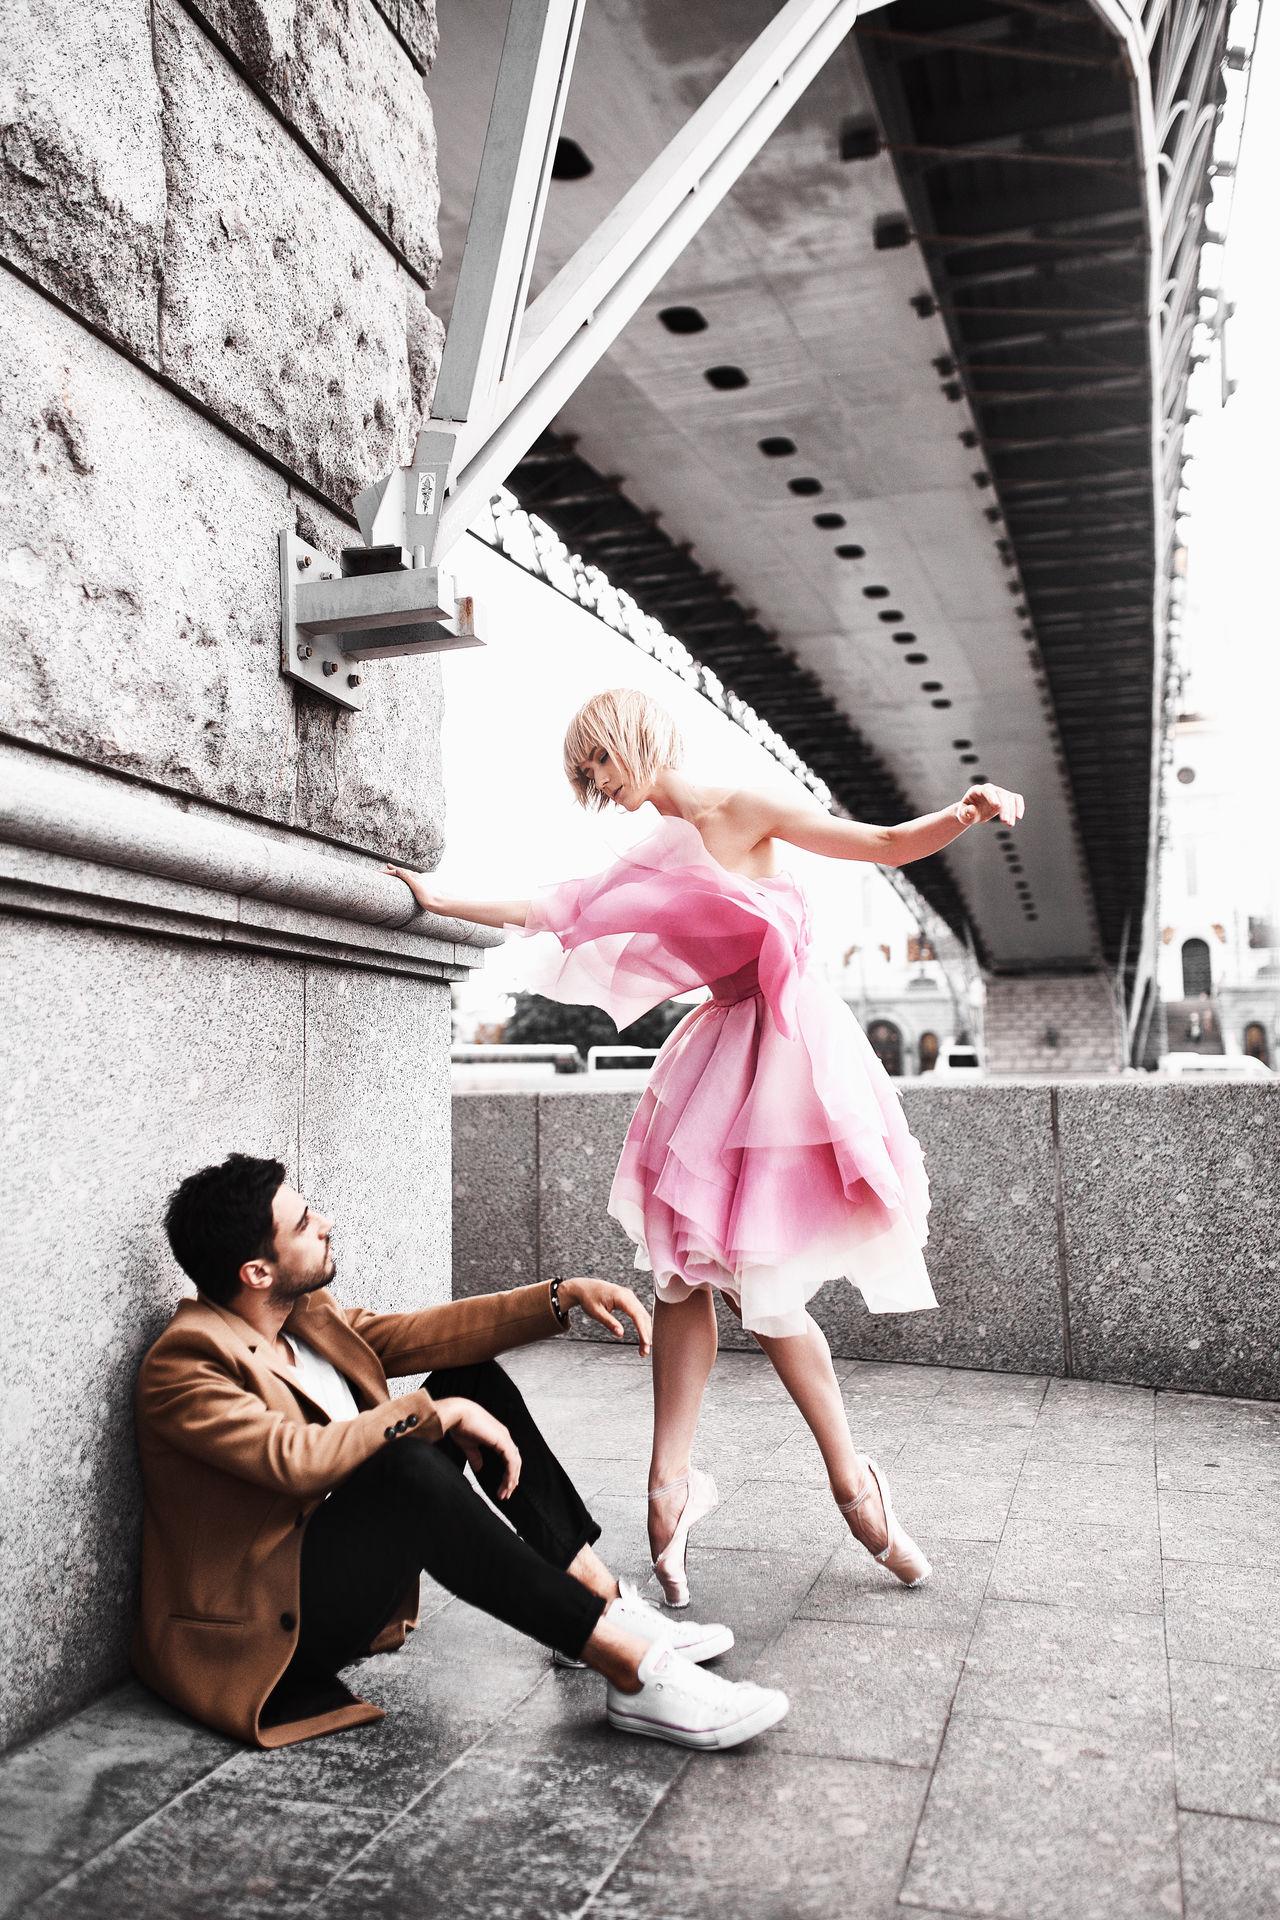 Angel Bridge Coat Day Dence Dress Fashion Friendship Love Men People Red Dress Two People Young Women Москва мост